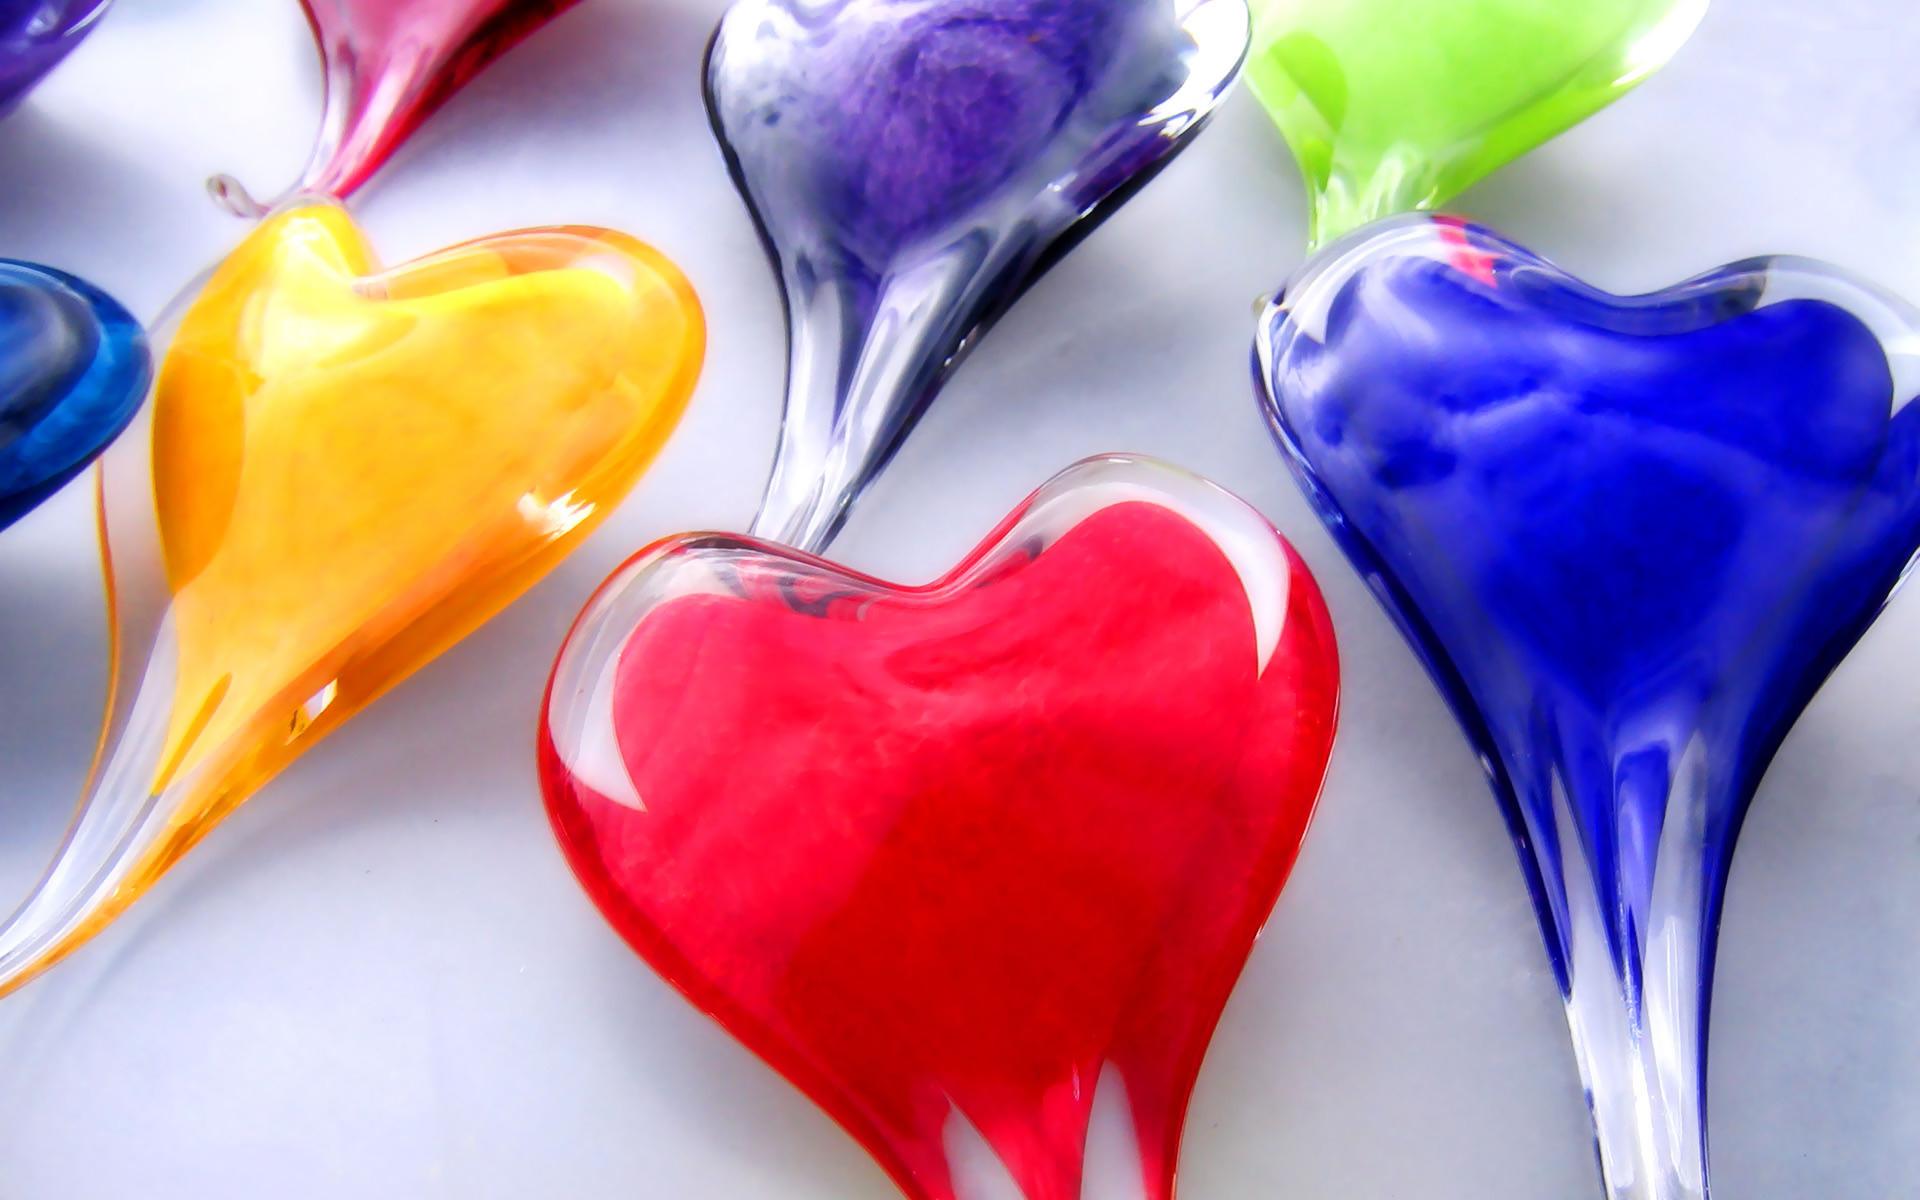 Assassins Creed 2 Hd Wallpapers Love Wallpapers Hd Amor Fondos De Pantalla Love 3d